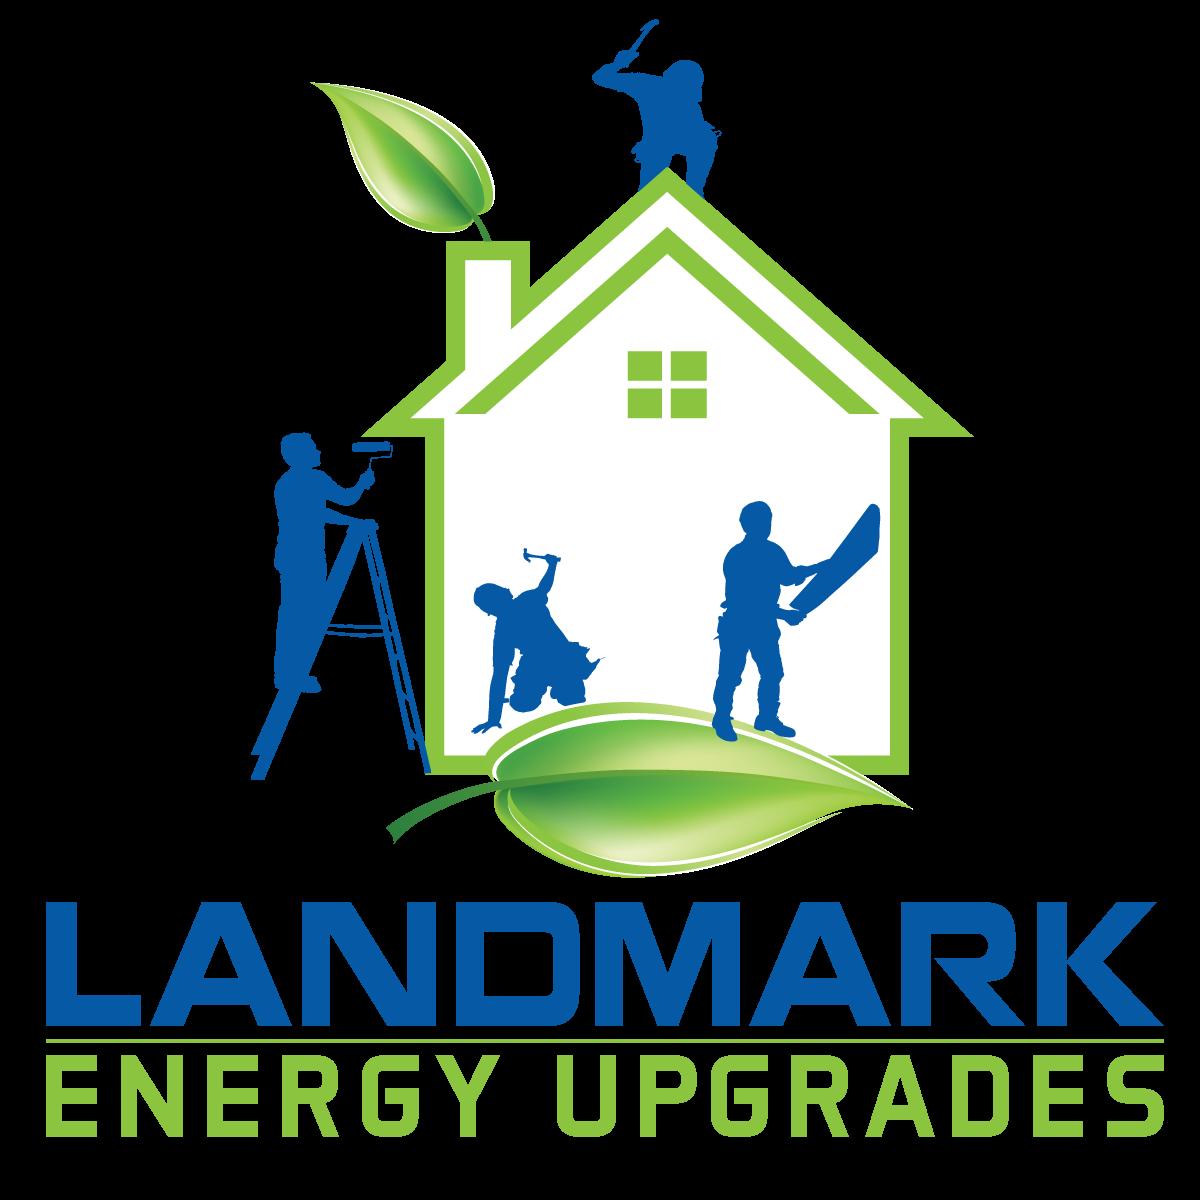 Landmark Energy Upgrades